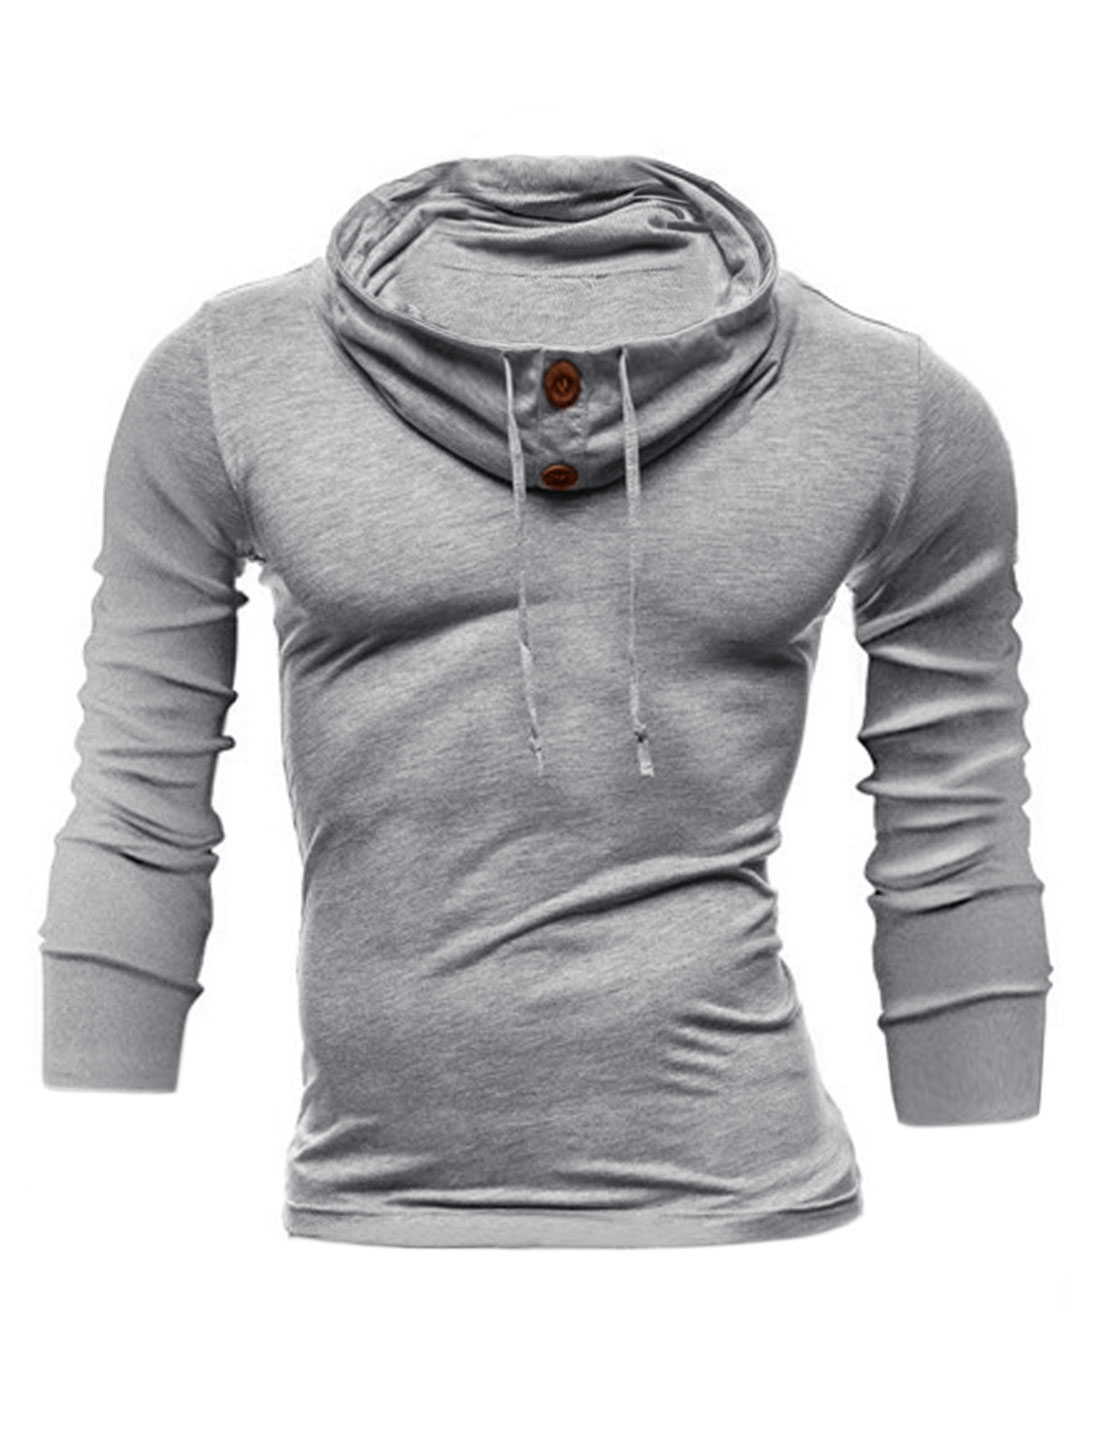 Men Funnel Neck Long Sleeves Buttons Decor Upper Sweatshirt Light Gray M